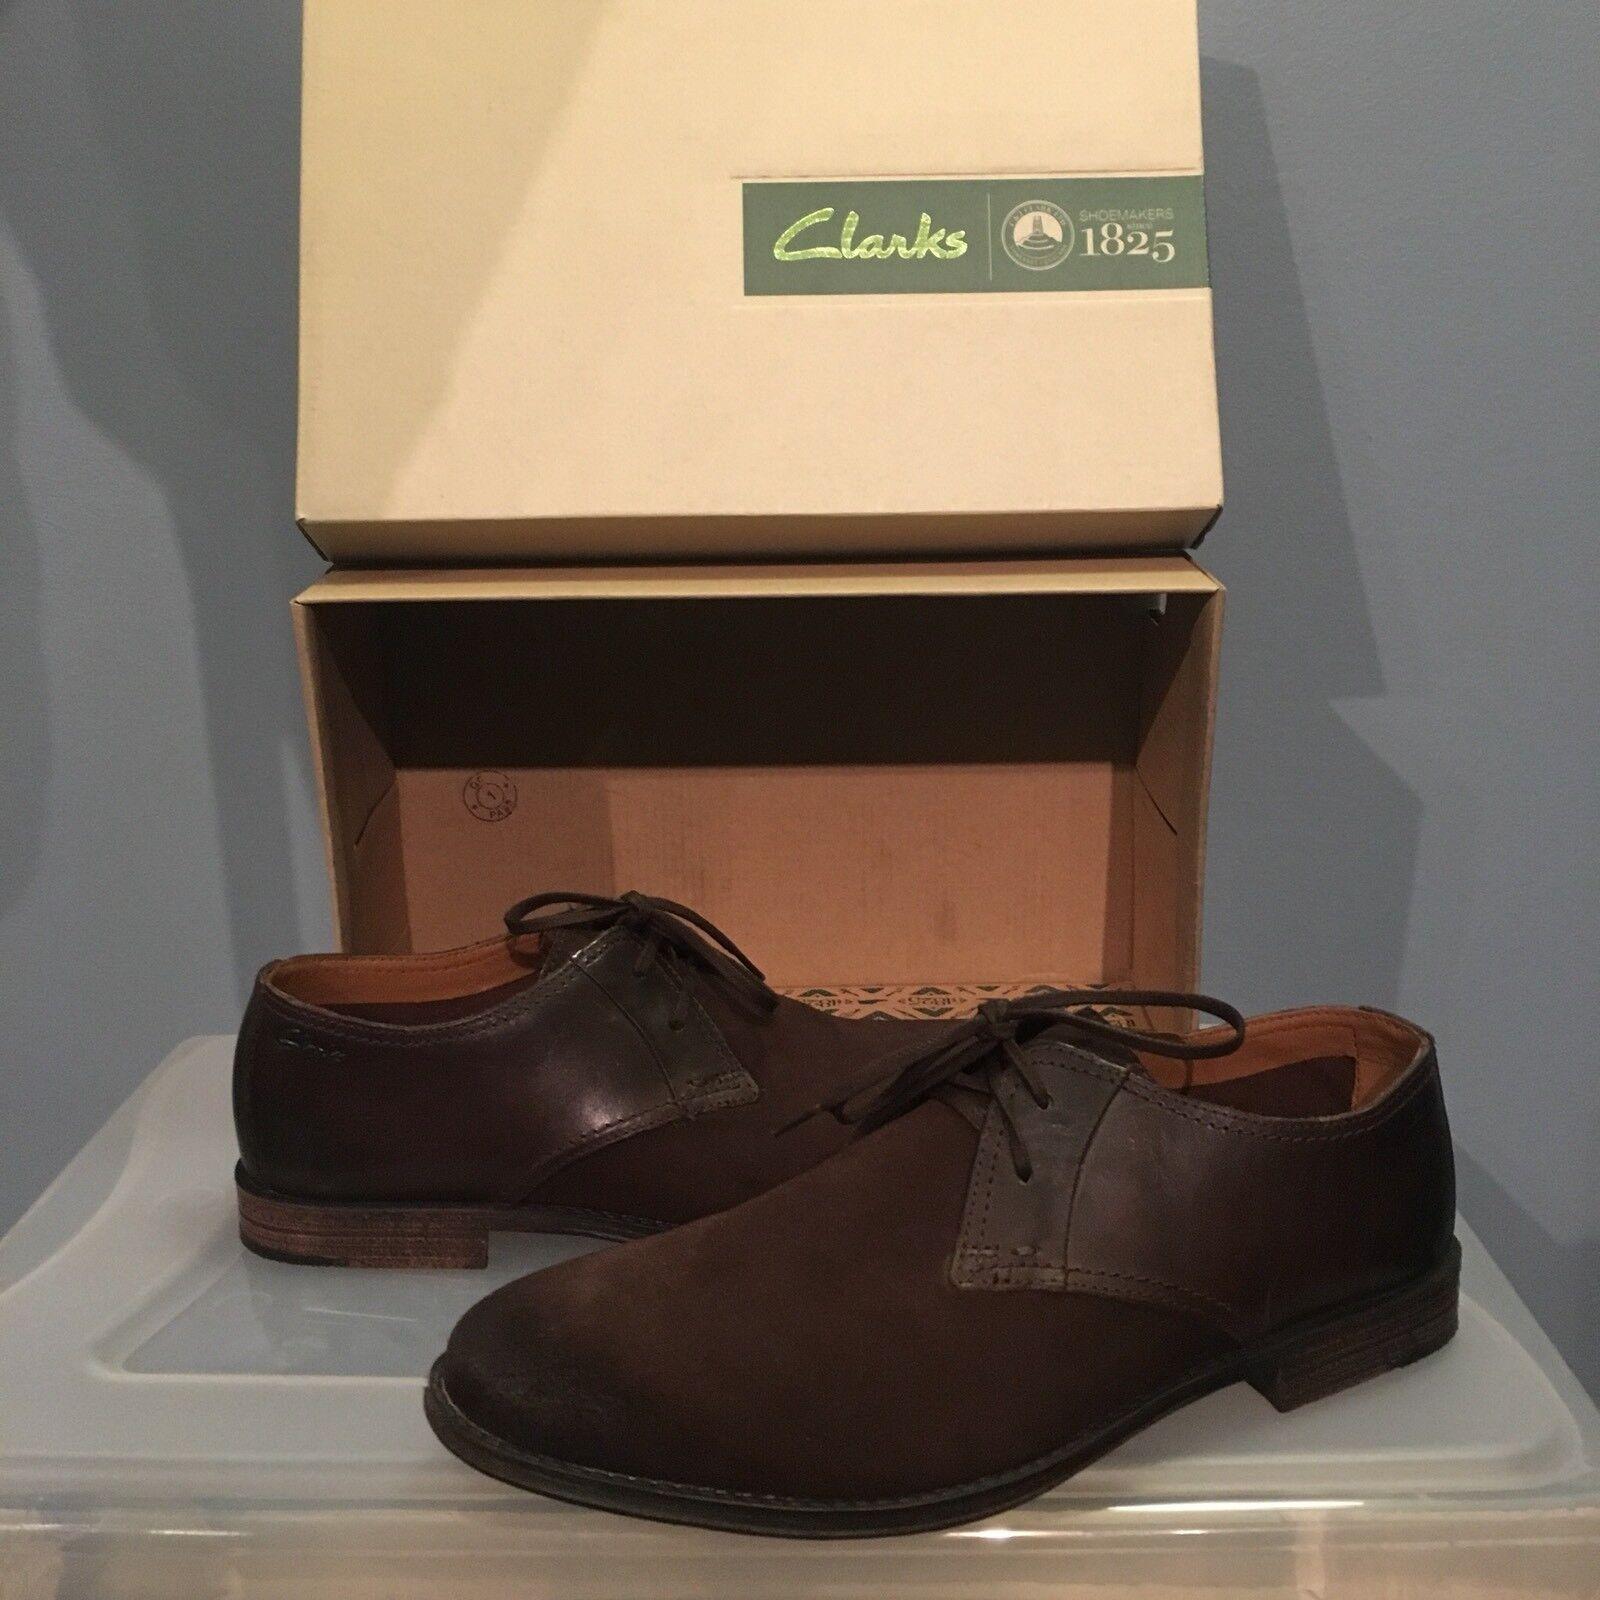 Clarks Bostonian Hawkley Walk US 9 New Mens Oxford Dress Casual shoes Dark Brown